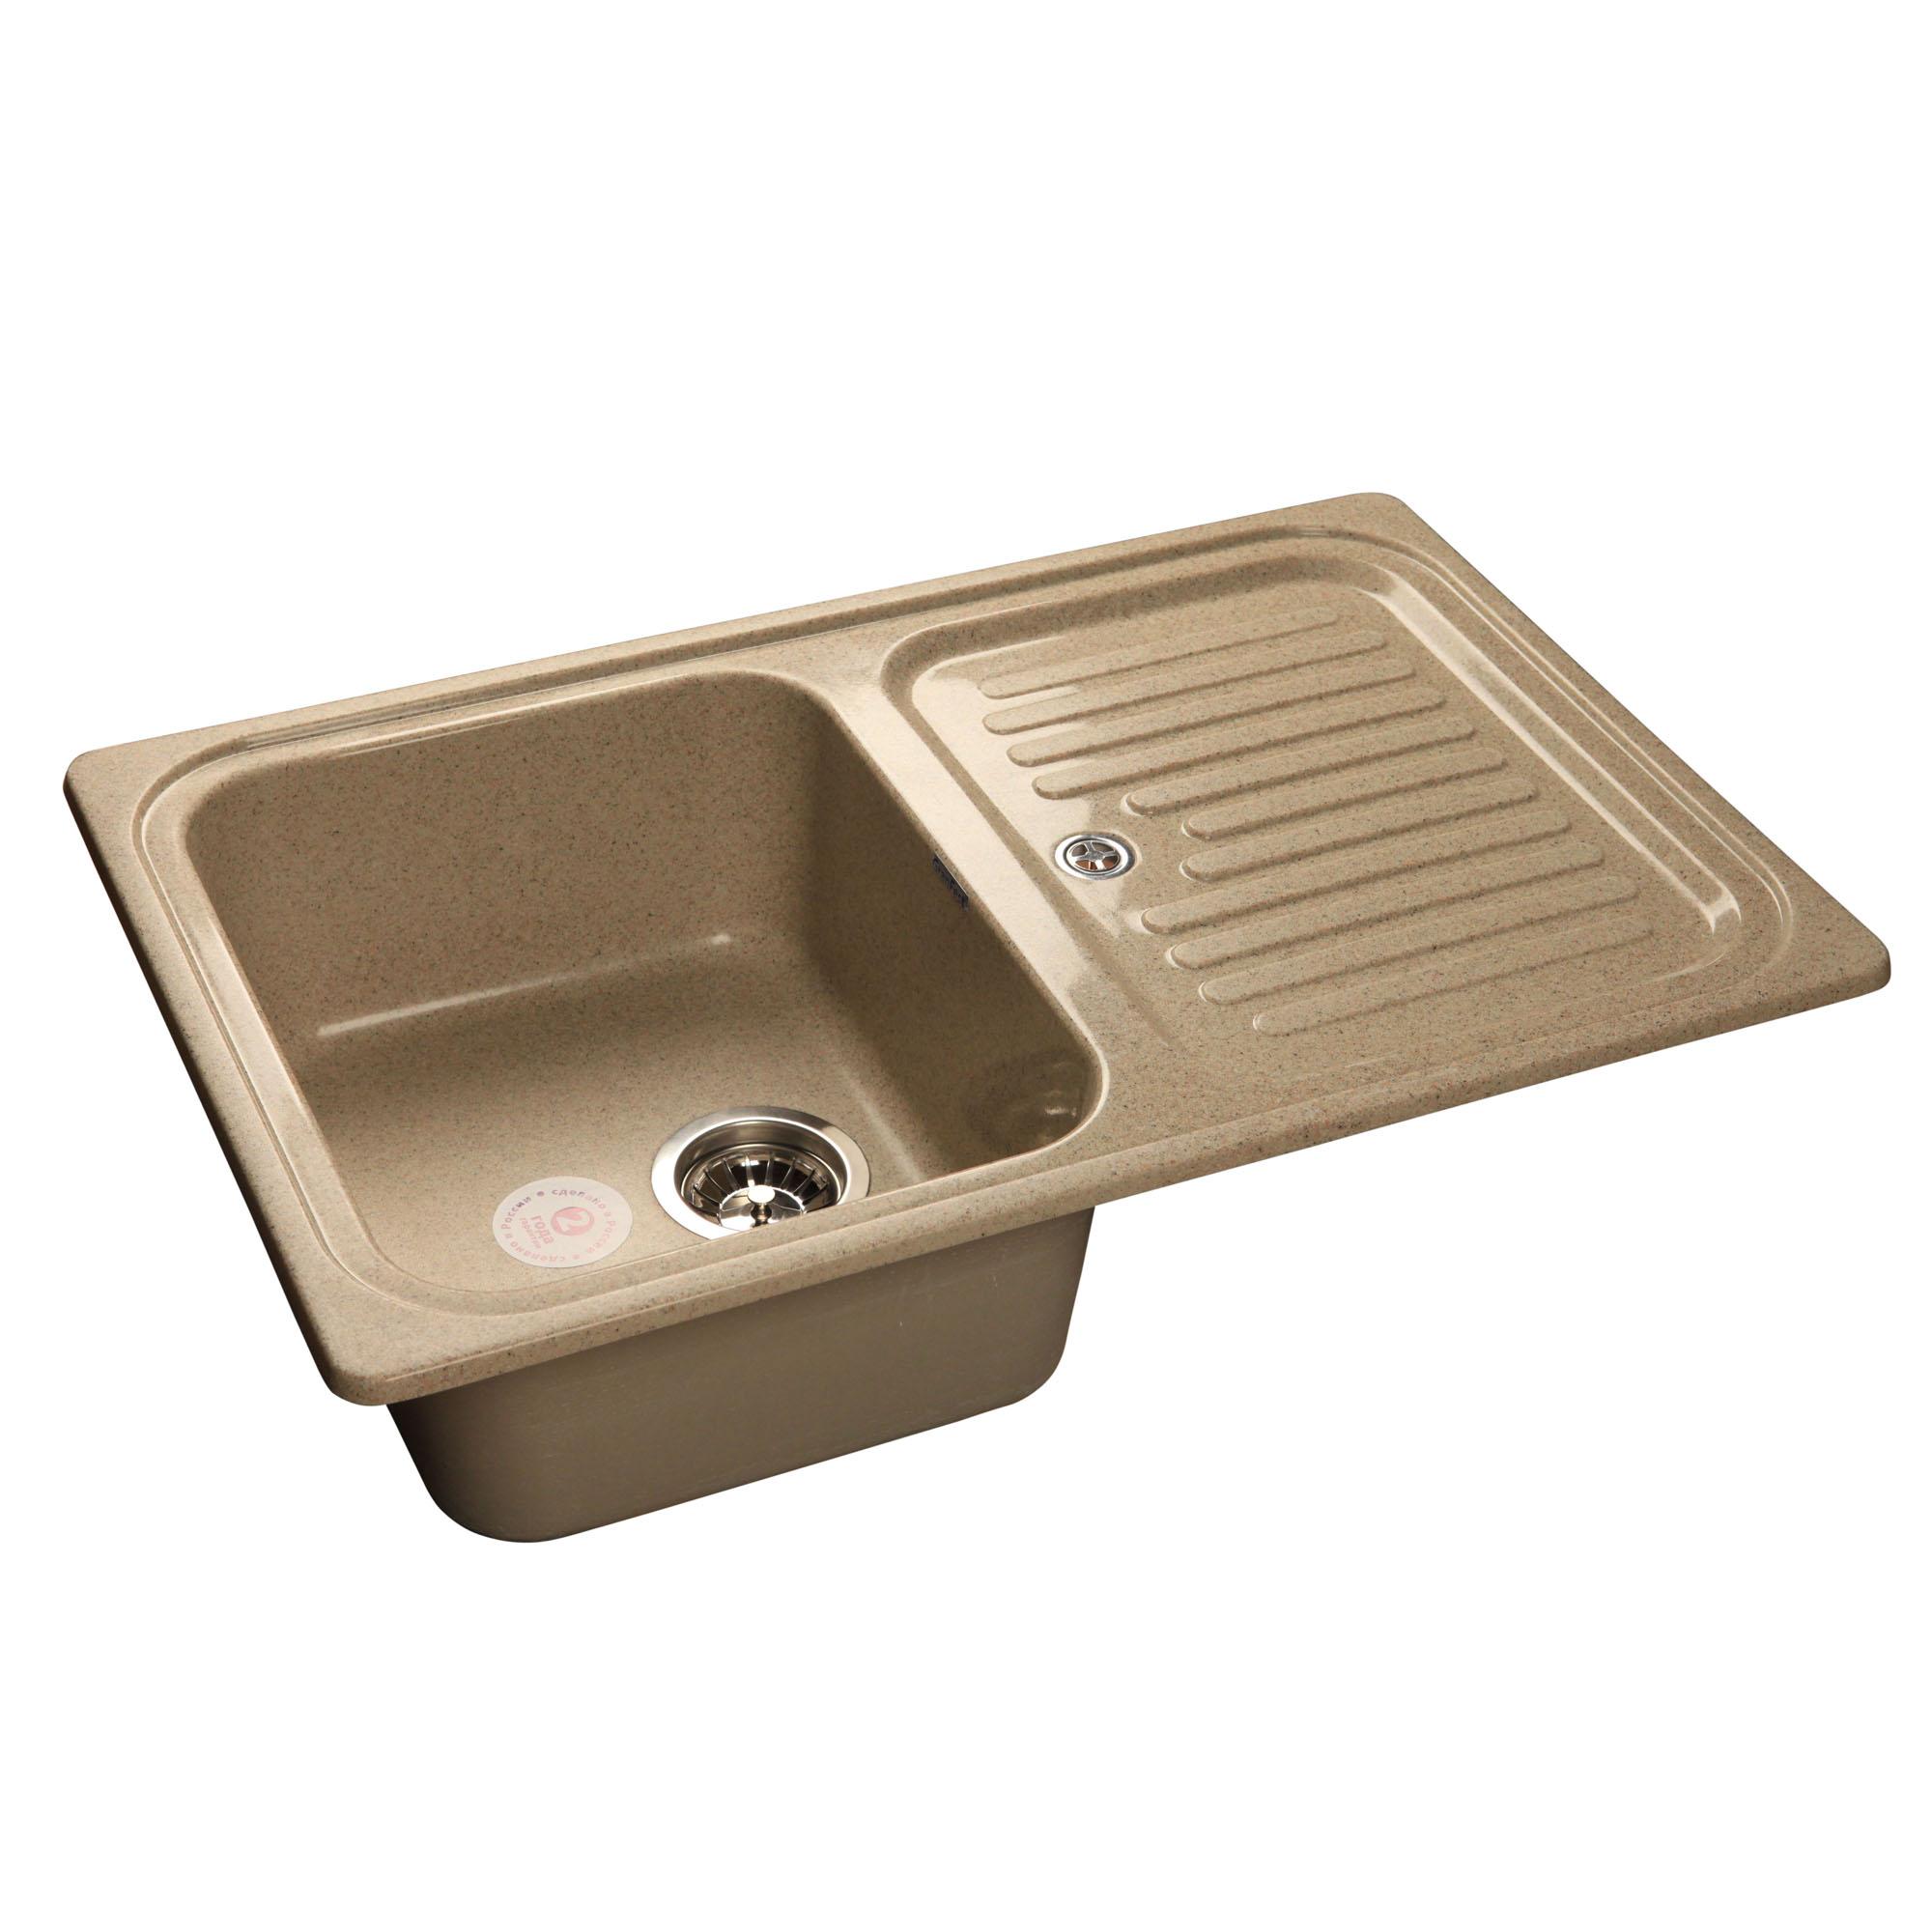 Кухонная мойка GranFest Standart GF-S780L песочный granfest gf s780l песочный